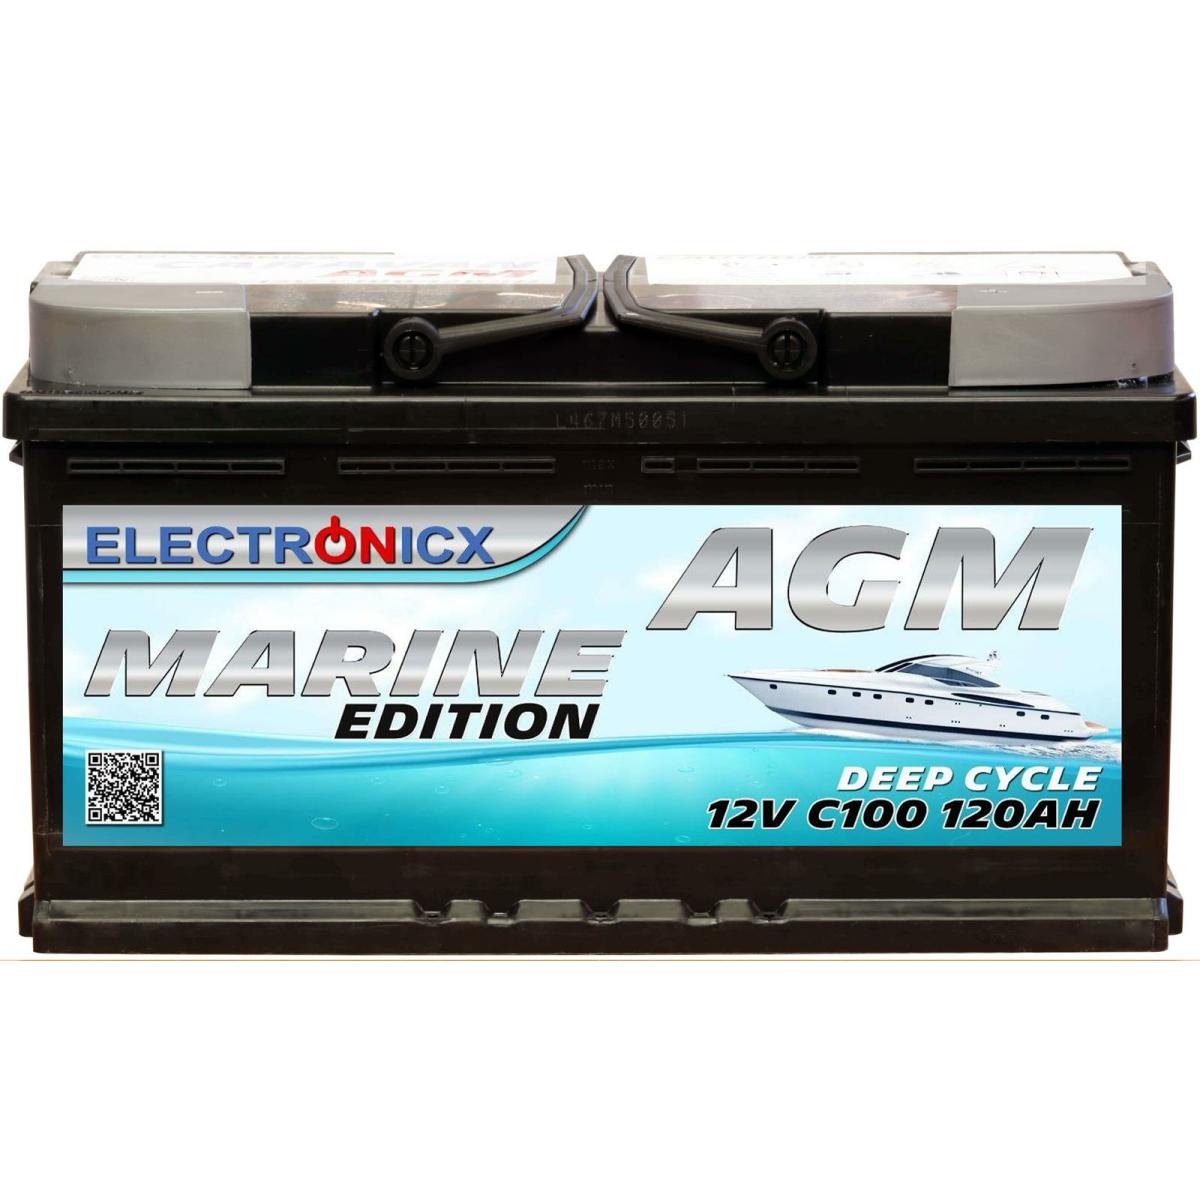 Electronicx marine edition battery agm 120 ah 12v boat ship supply battery